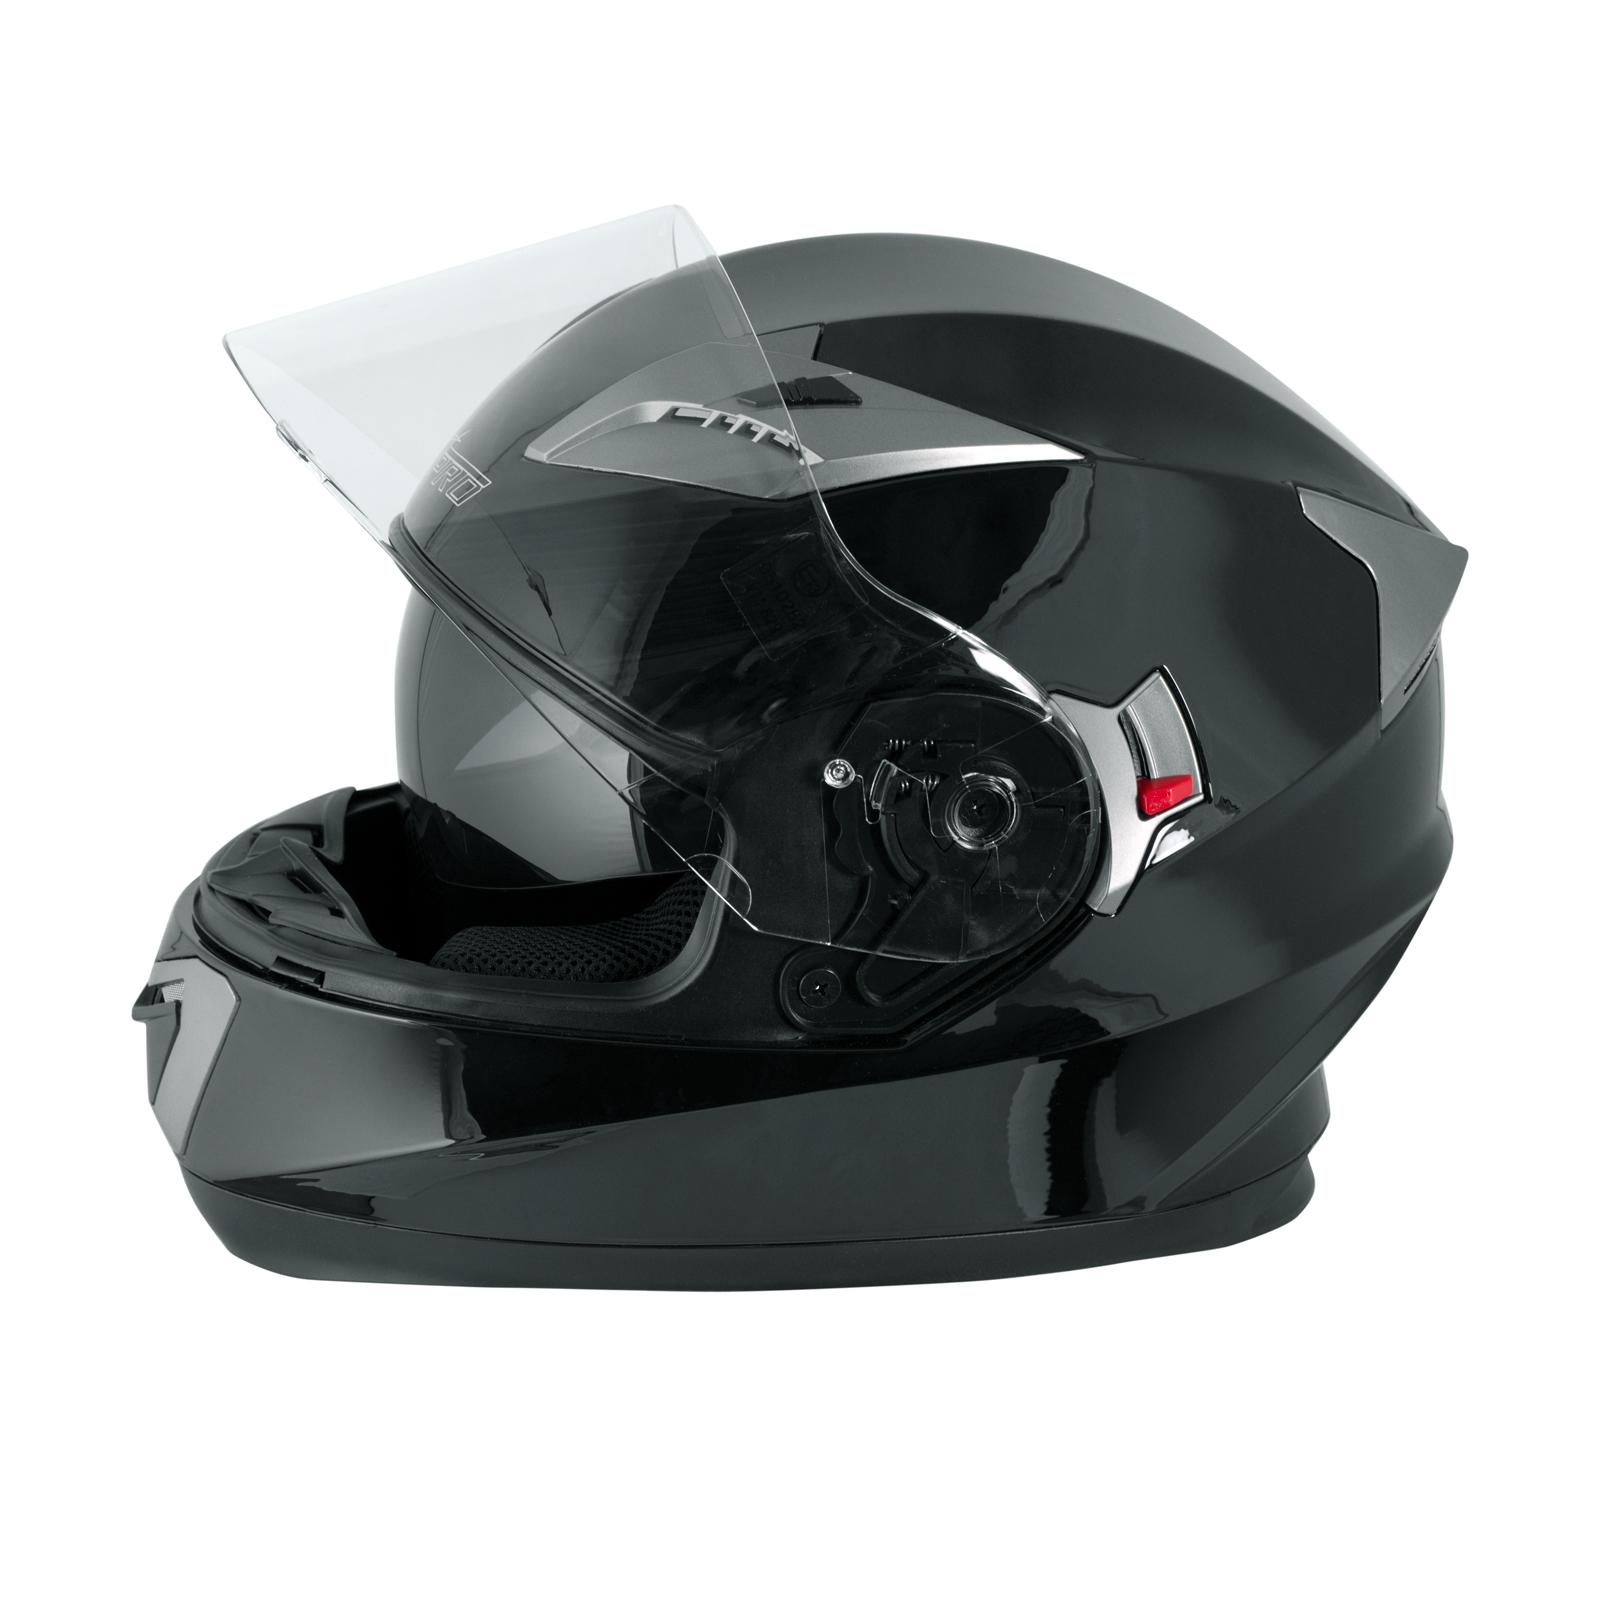 miniatura 6 - Integral-Helm-Motorrad-Roller-Sonnenblende-Touring-Schwarz